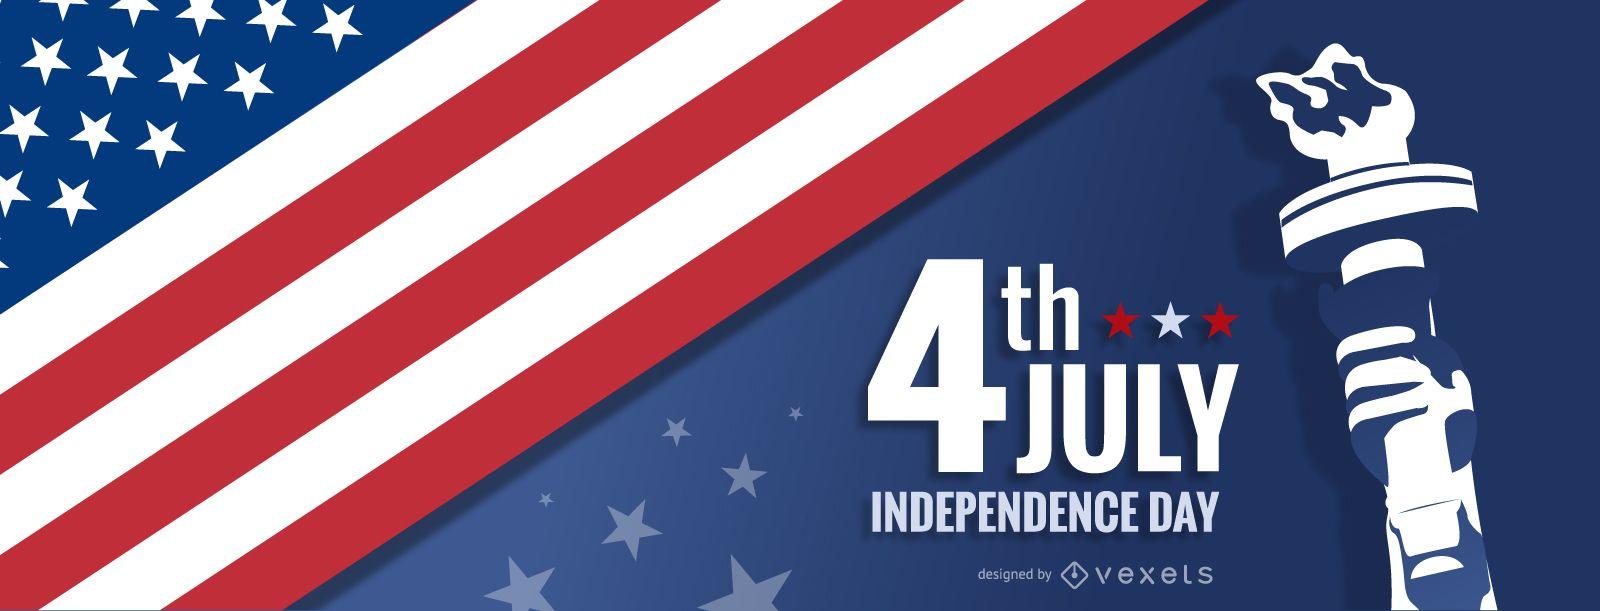 Independence Day header